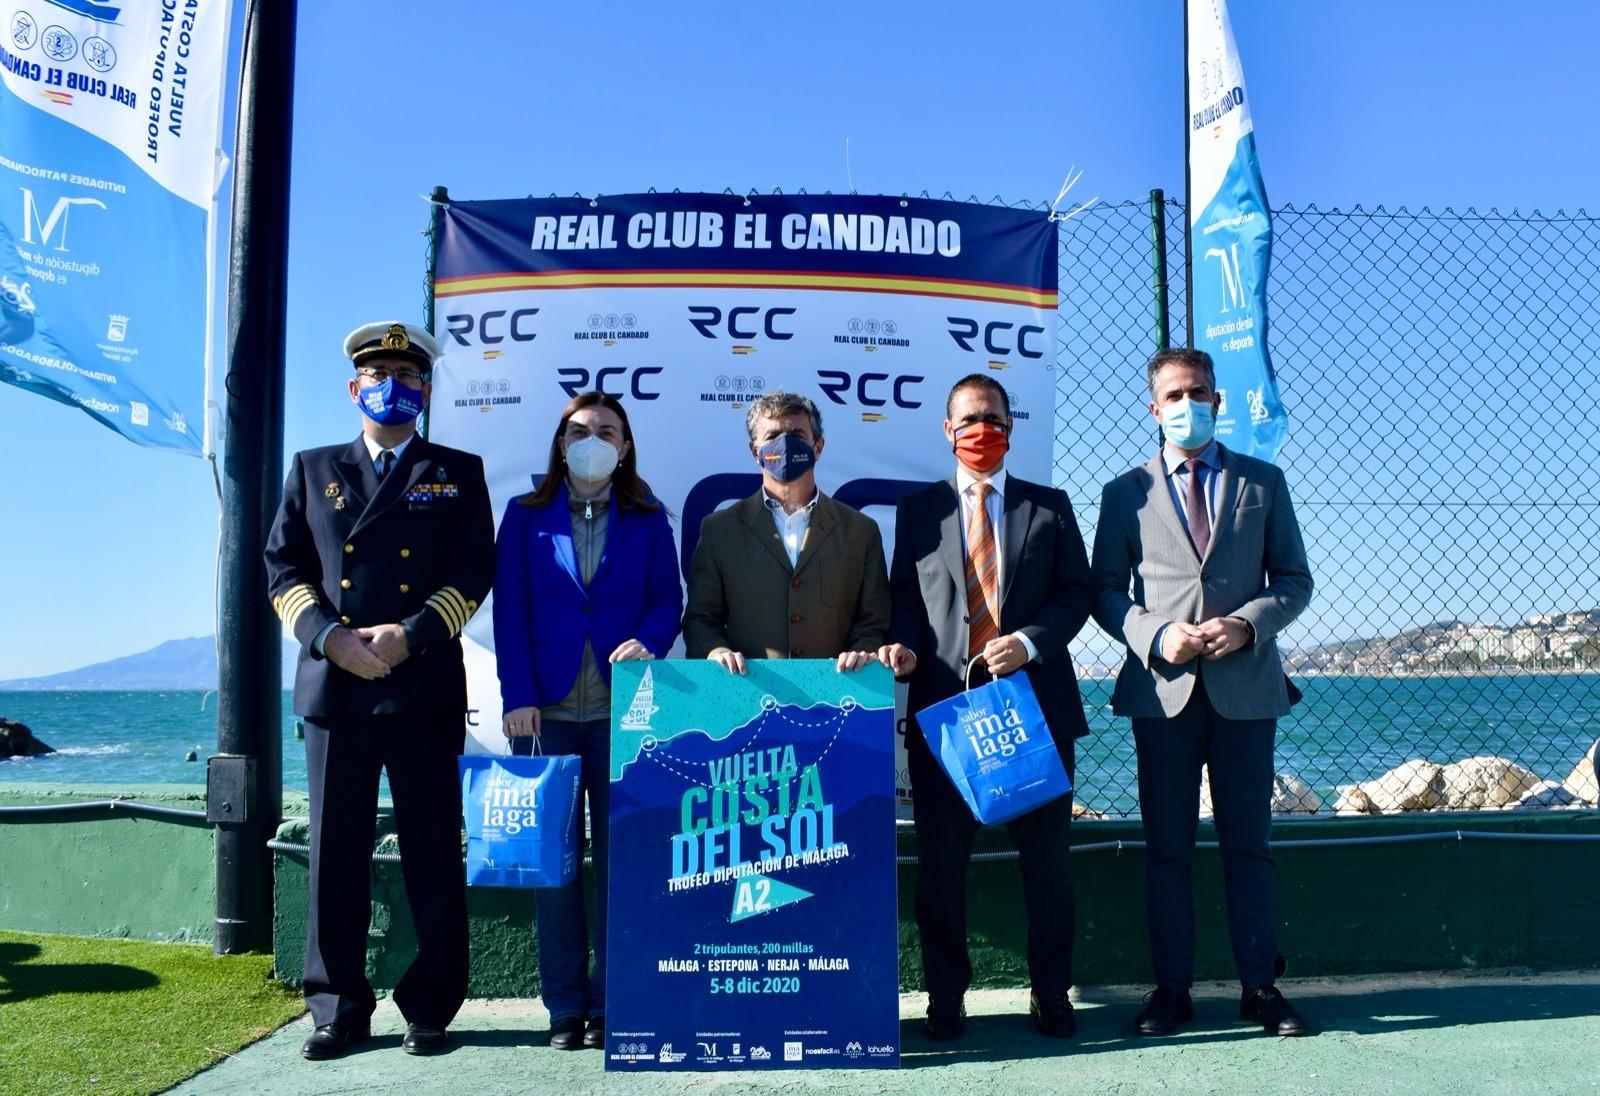 Vuelta Costa Del Sol A2, Trofeo Diputación De Málaga